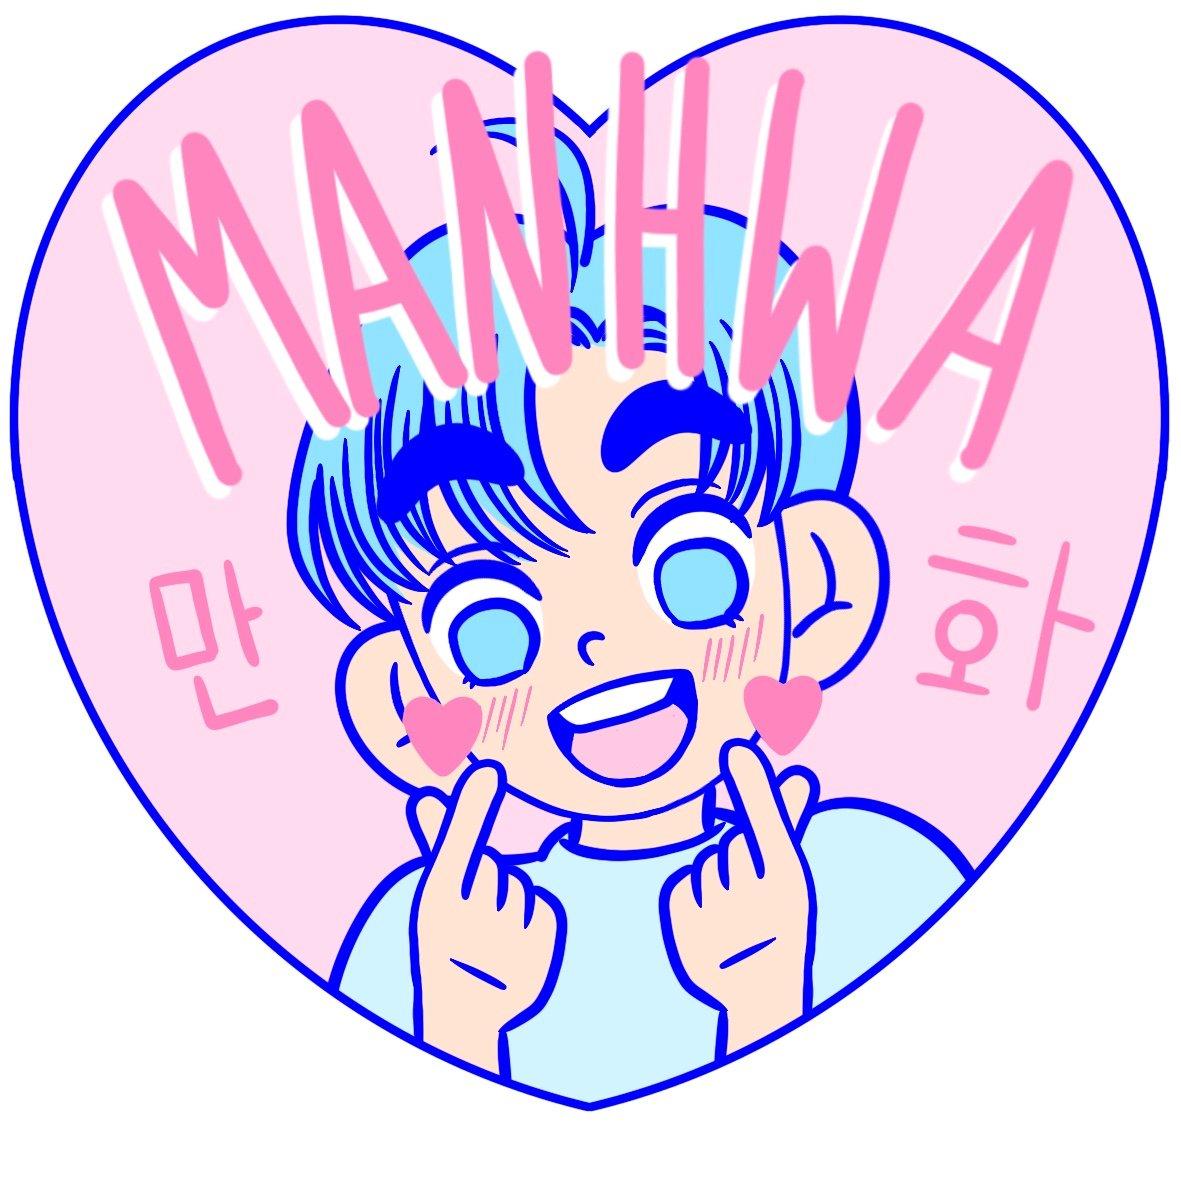 Image of Manhwa sticker